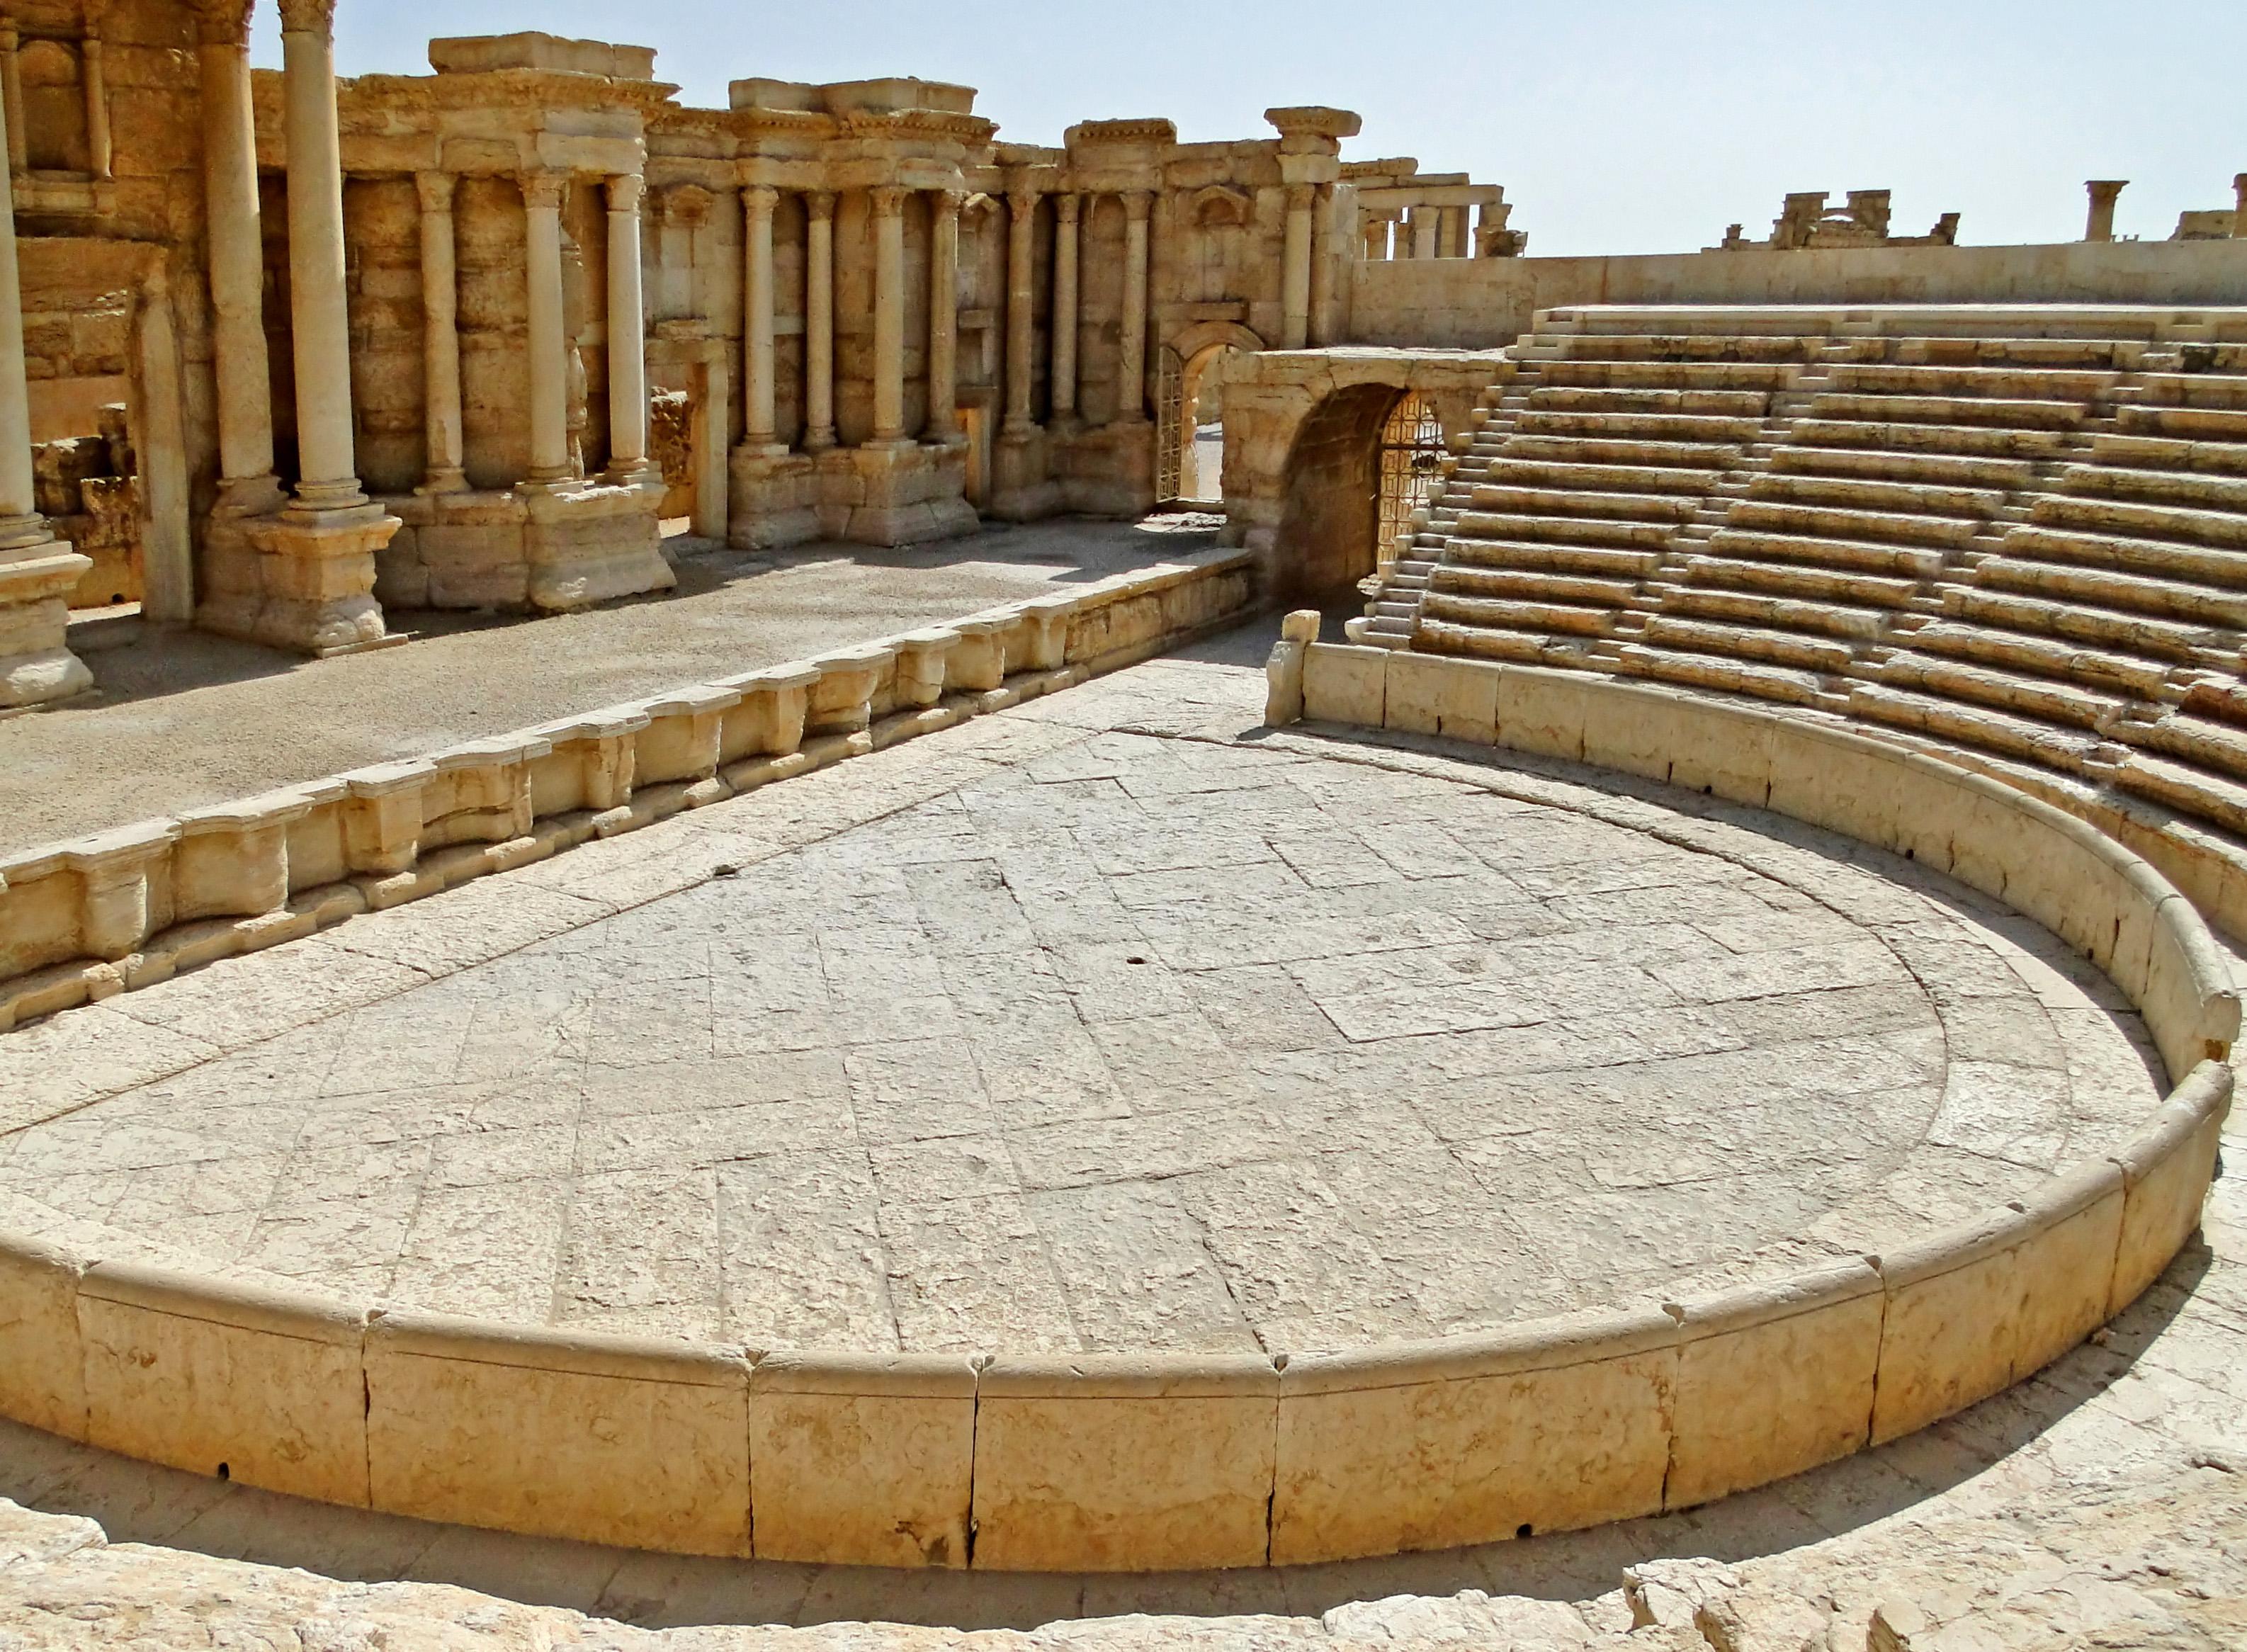 Roman_theatre_of_Palmyra_03